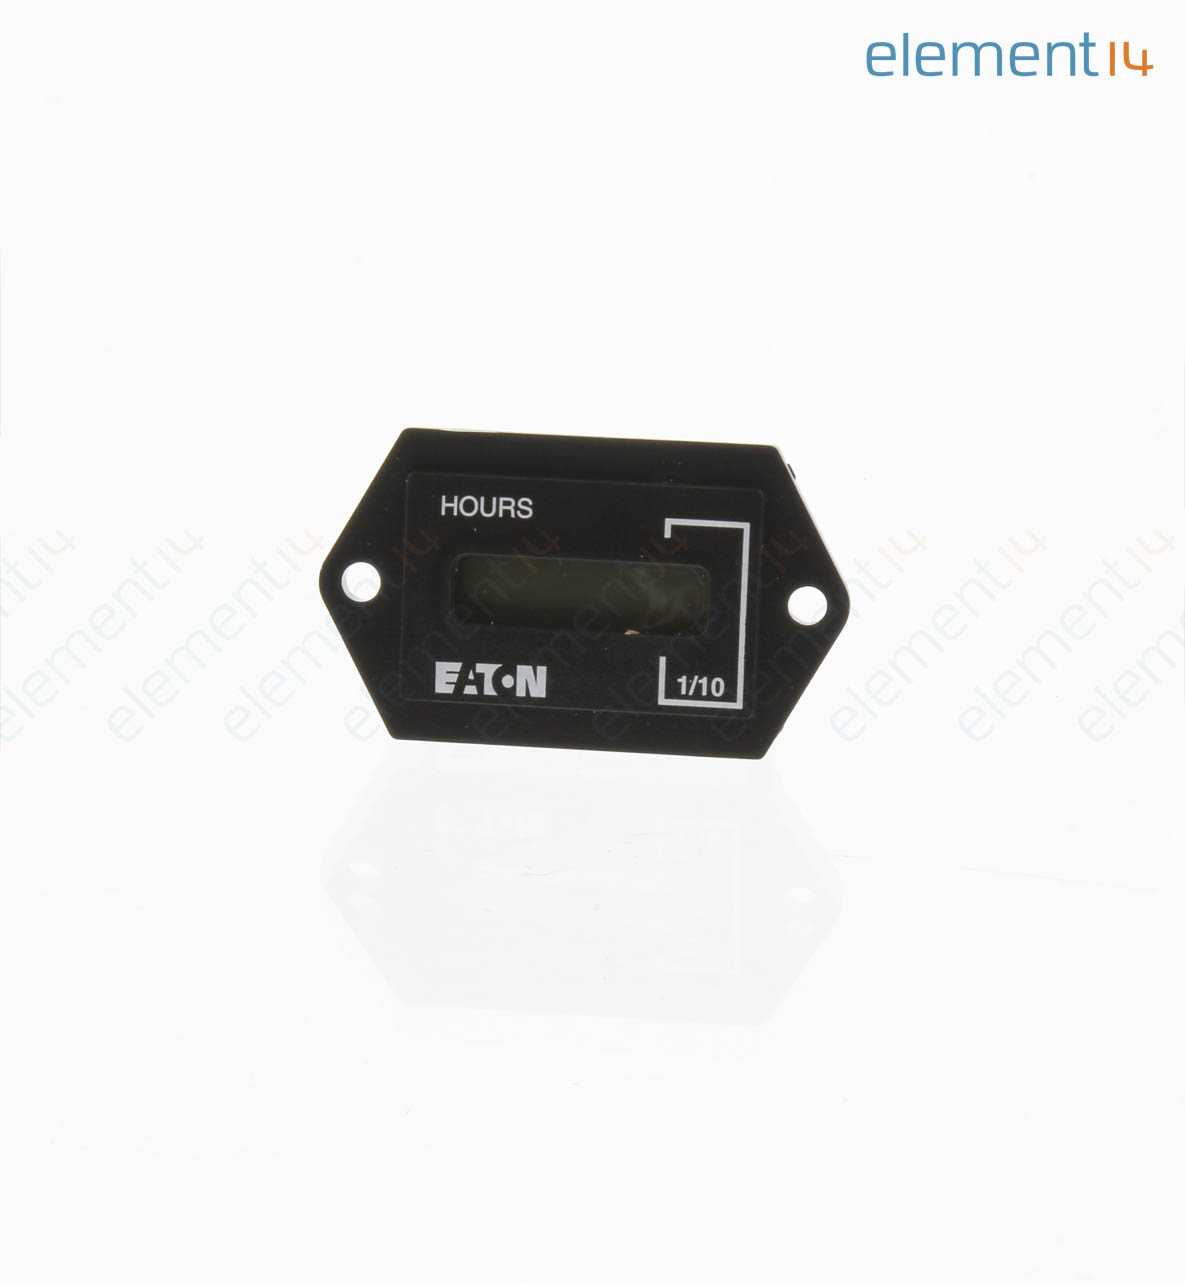 e42di2448230 eaton cutler hammer panel mount timer durant 100 vac e42di2448230 panel mount timer